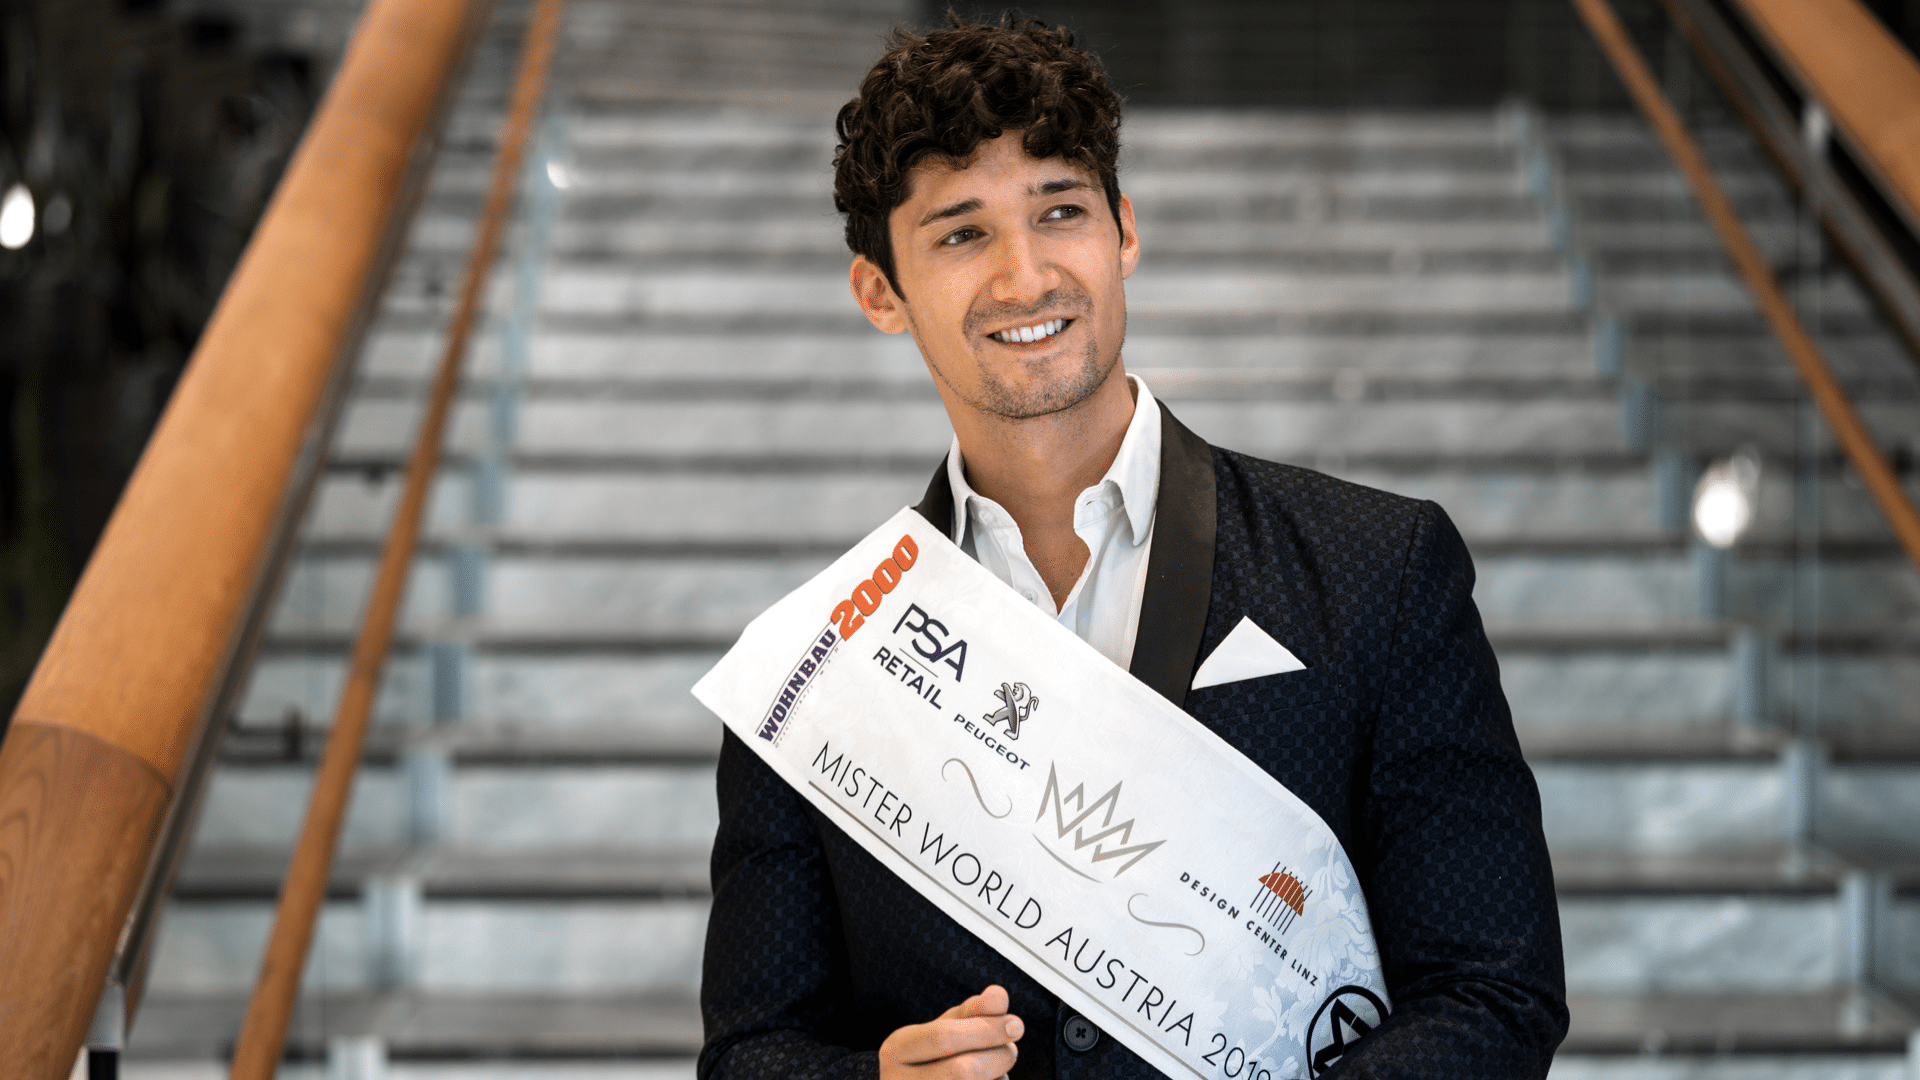 Mister World Europe Alberto Nodale